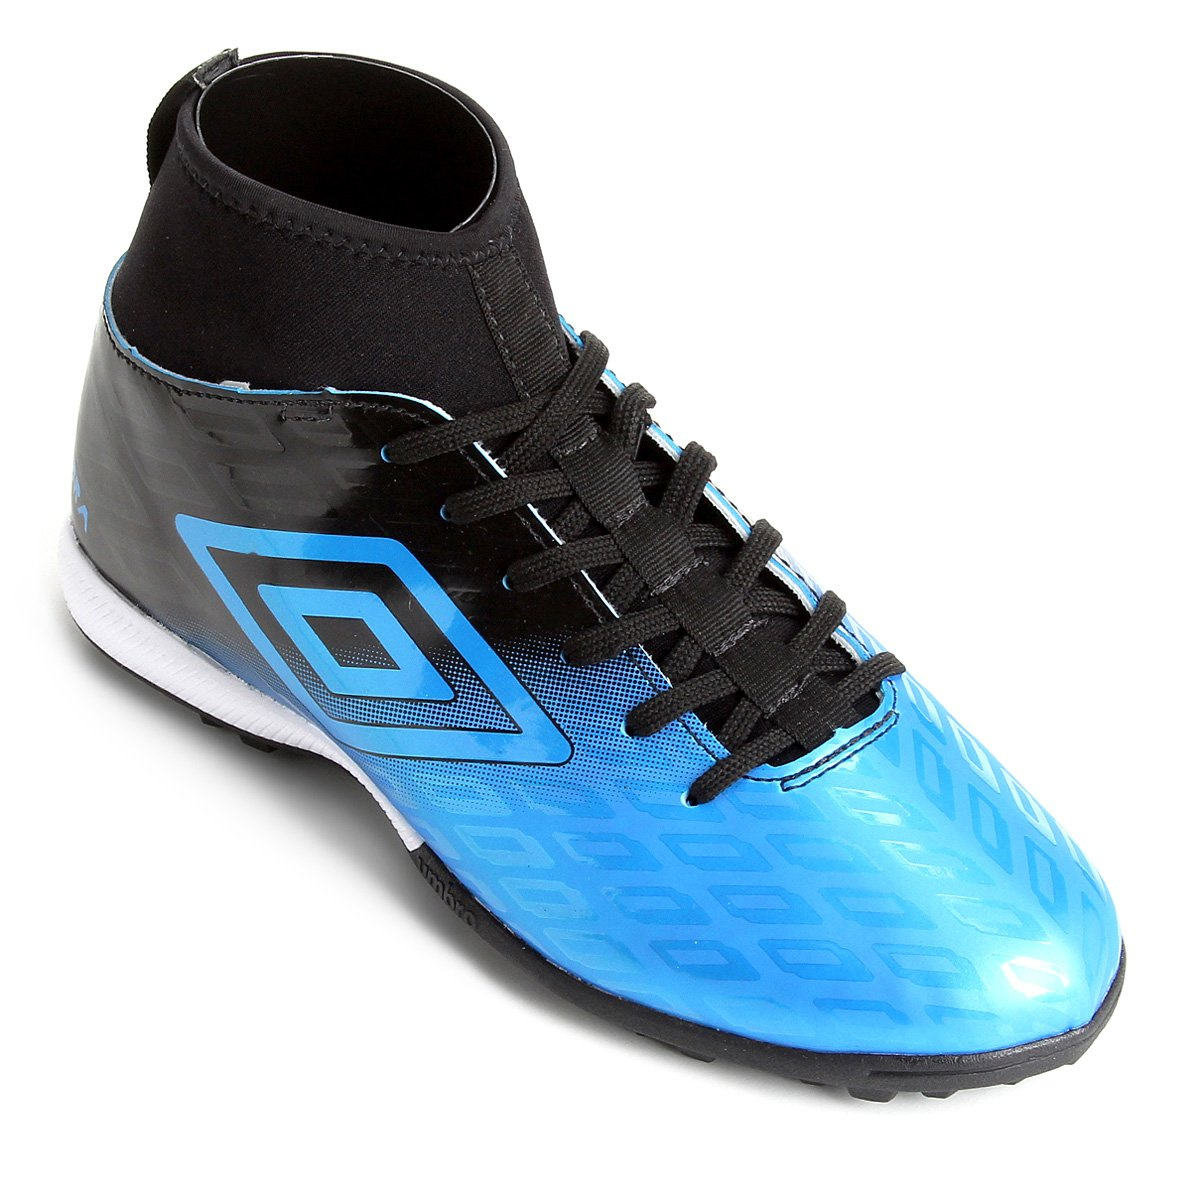 3903e5b2b4036 Chuteira Society Umbro Calibra - Azul e Preto | Netshoes